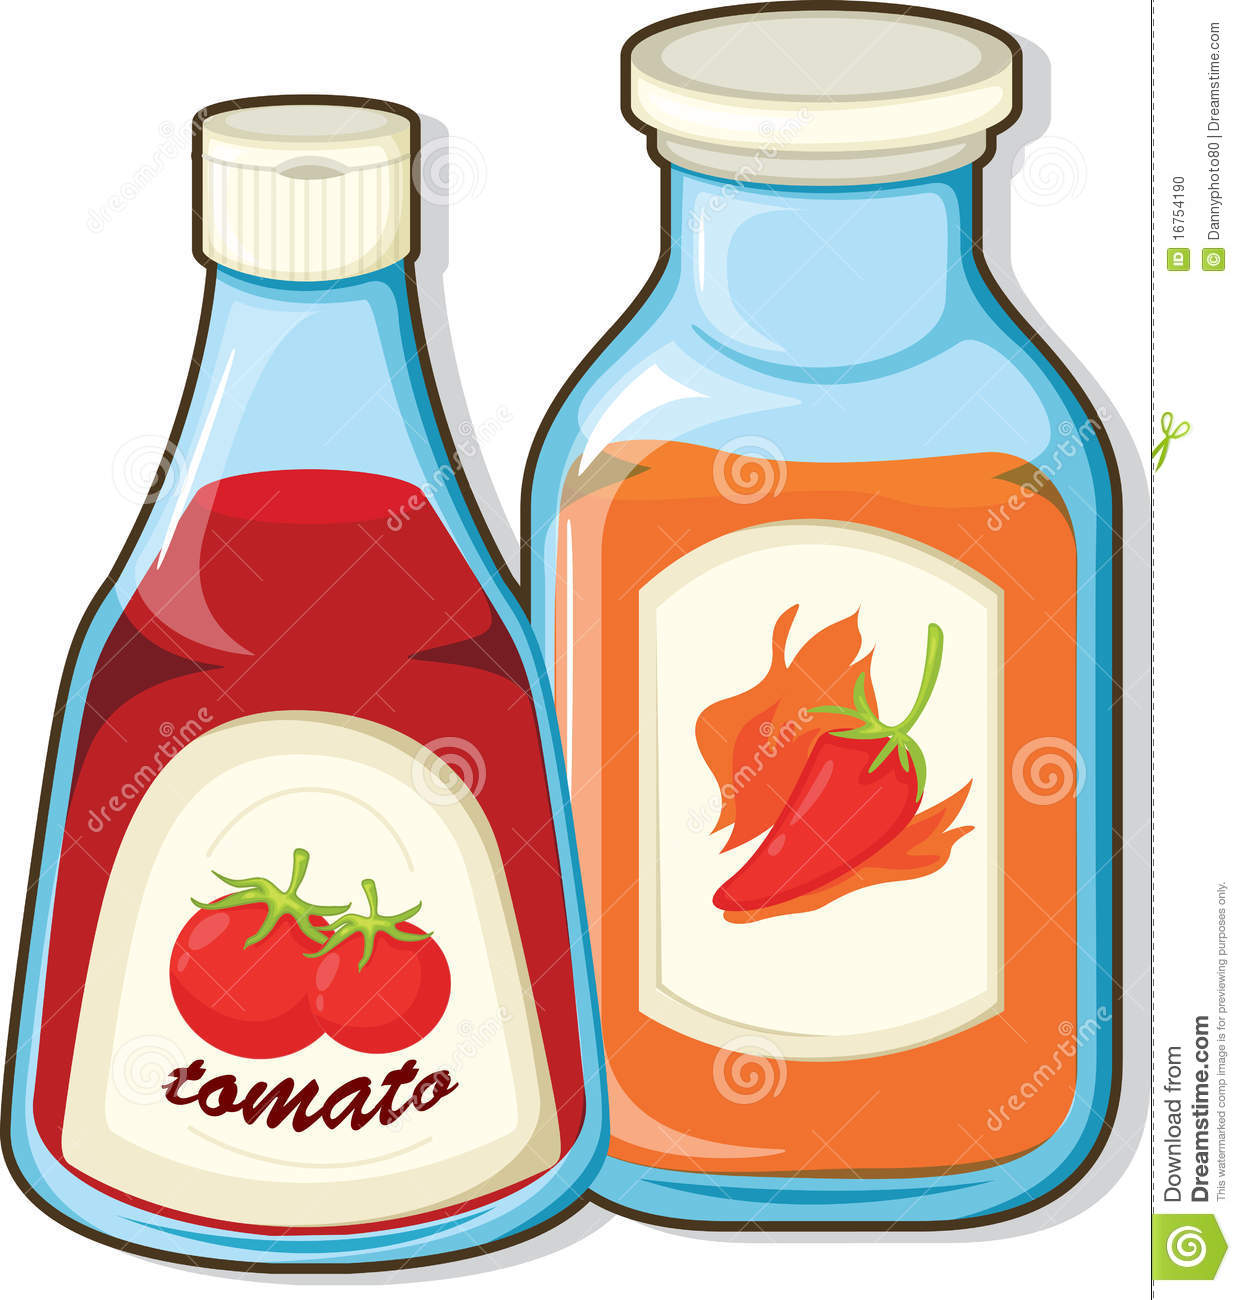 Sause clipart Panda Images Free Sauce Clipart